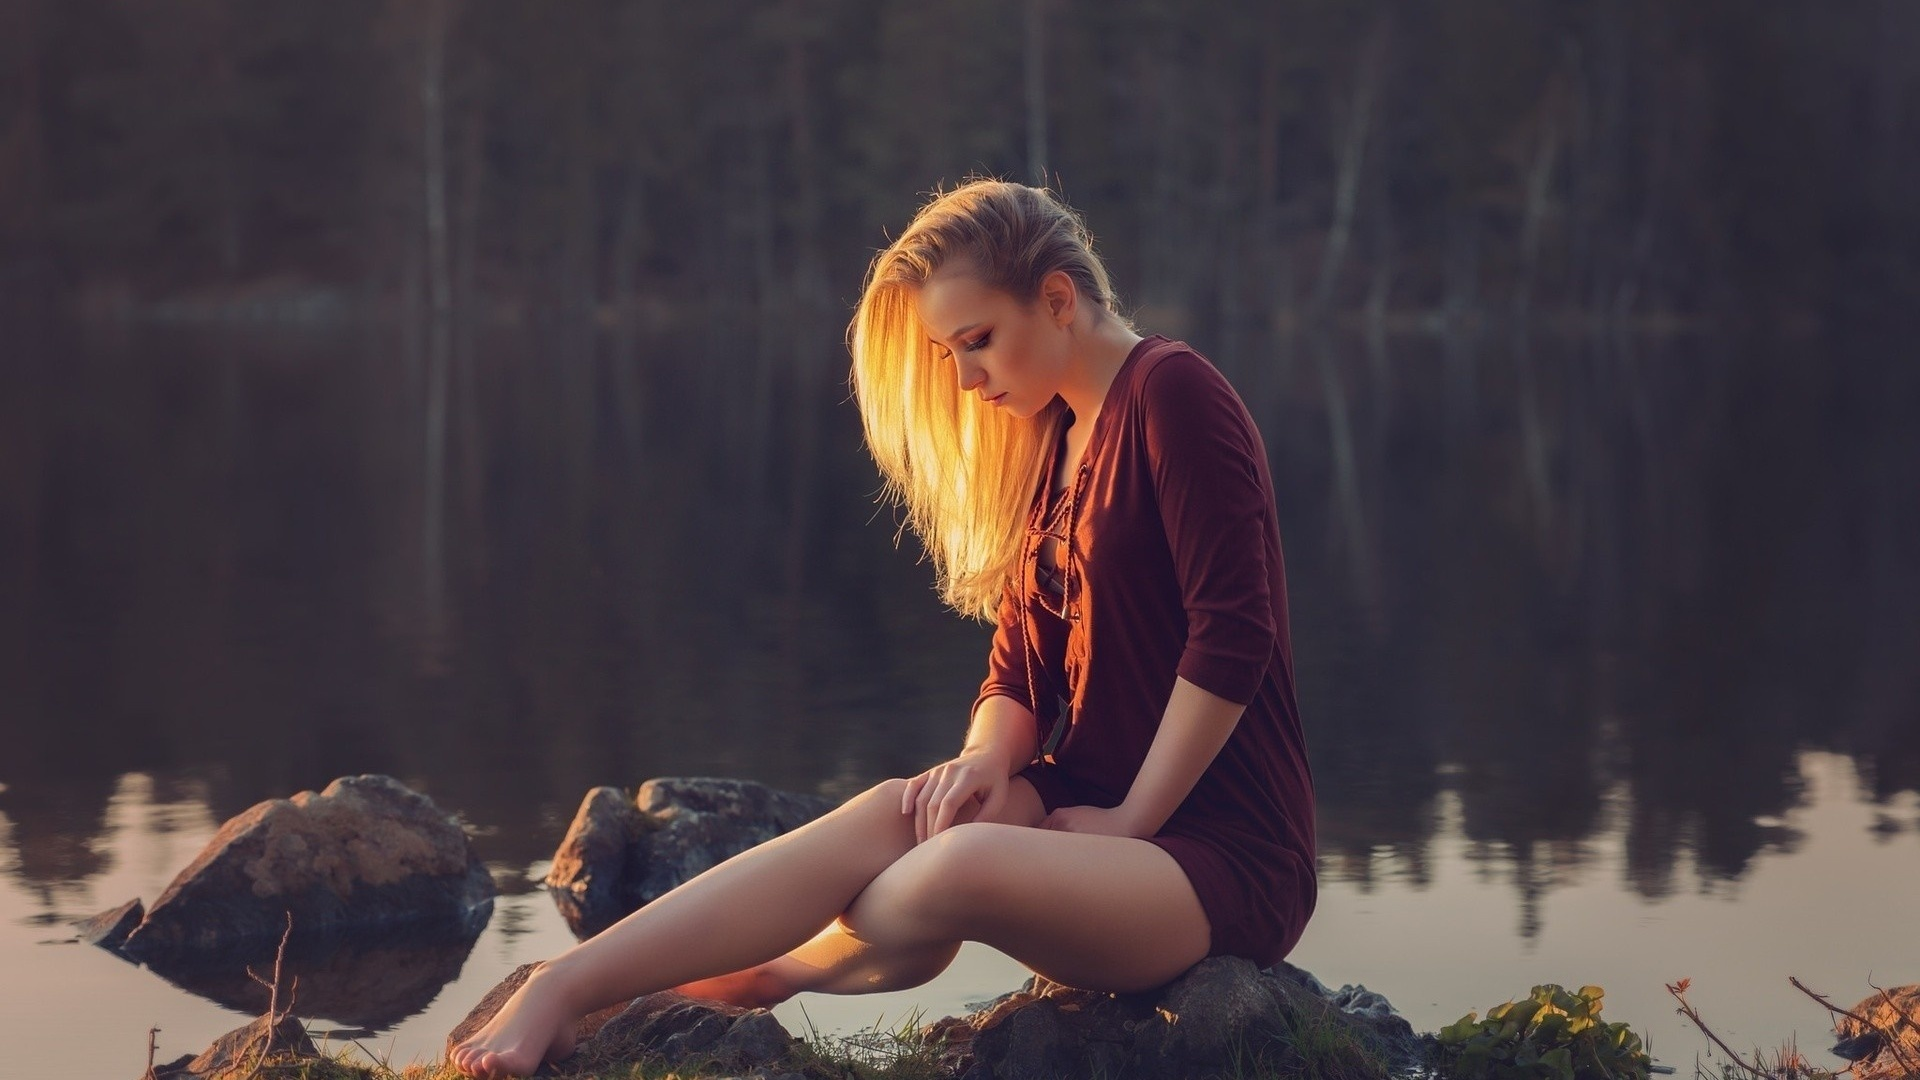 Картинка девушка в реке